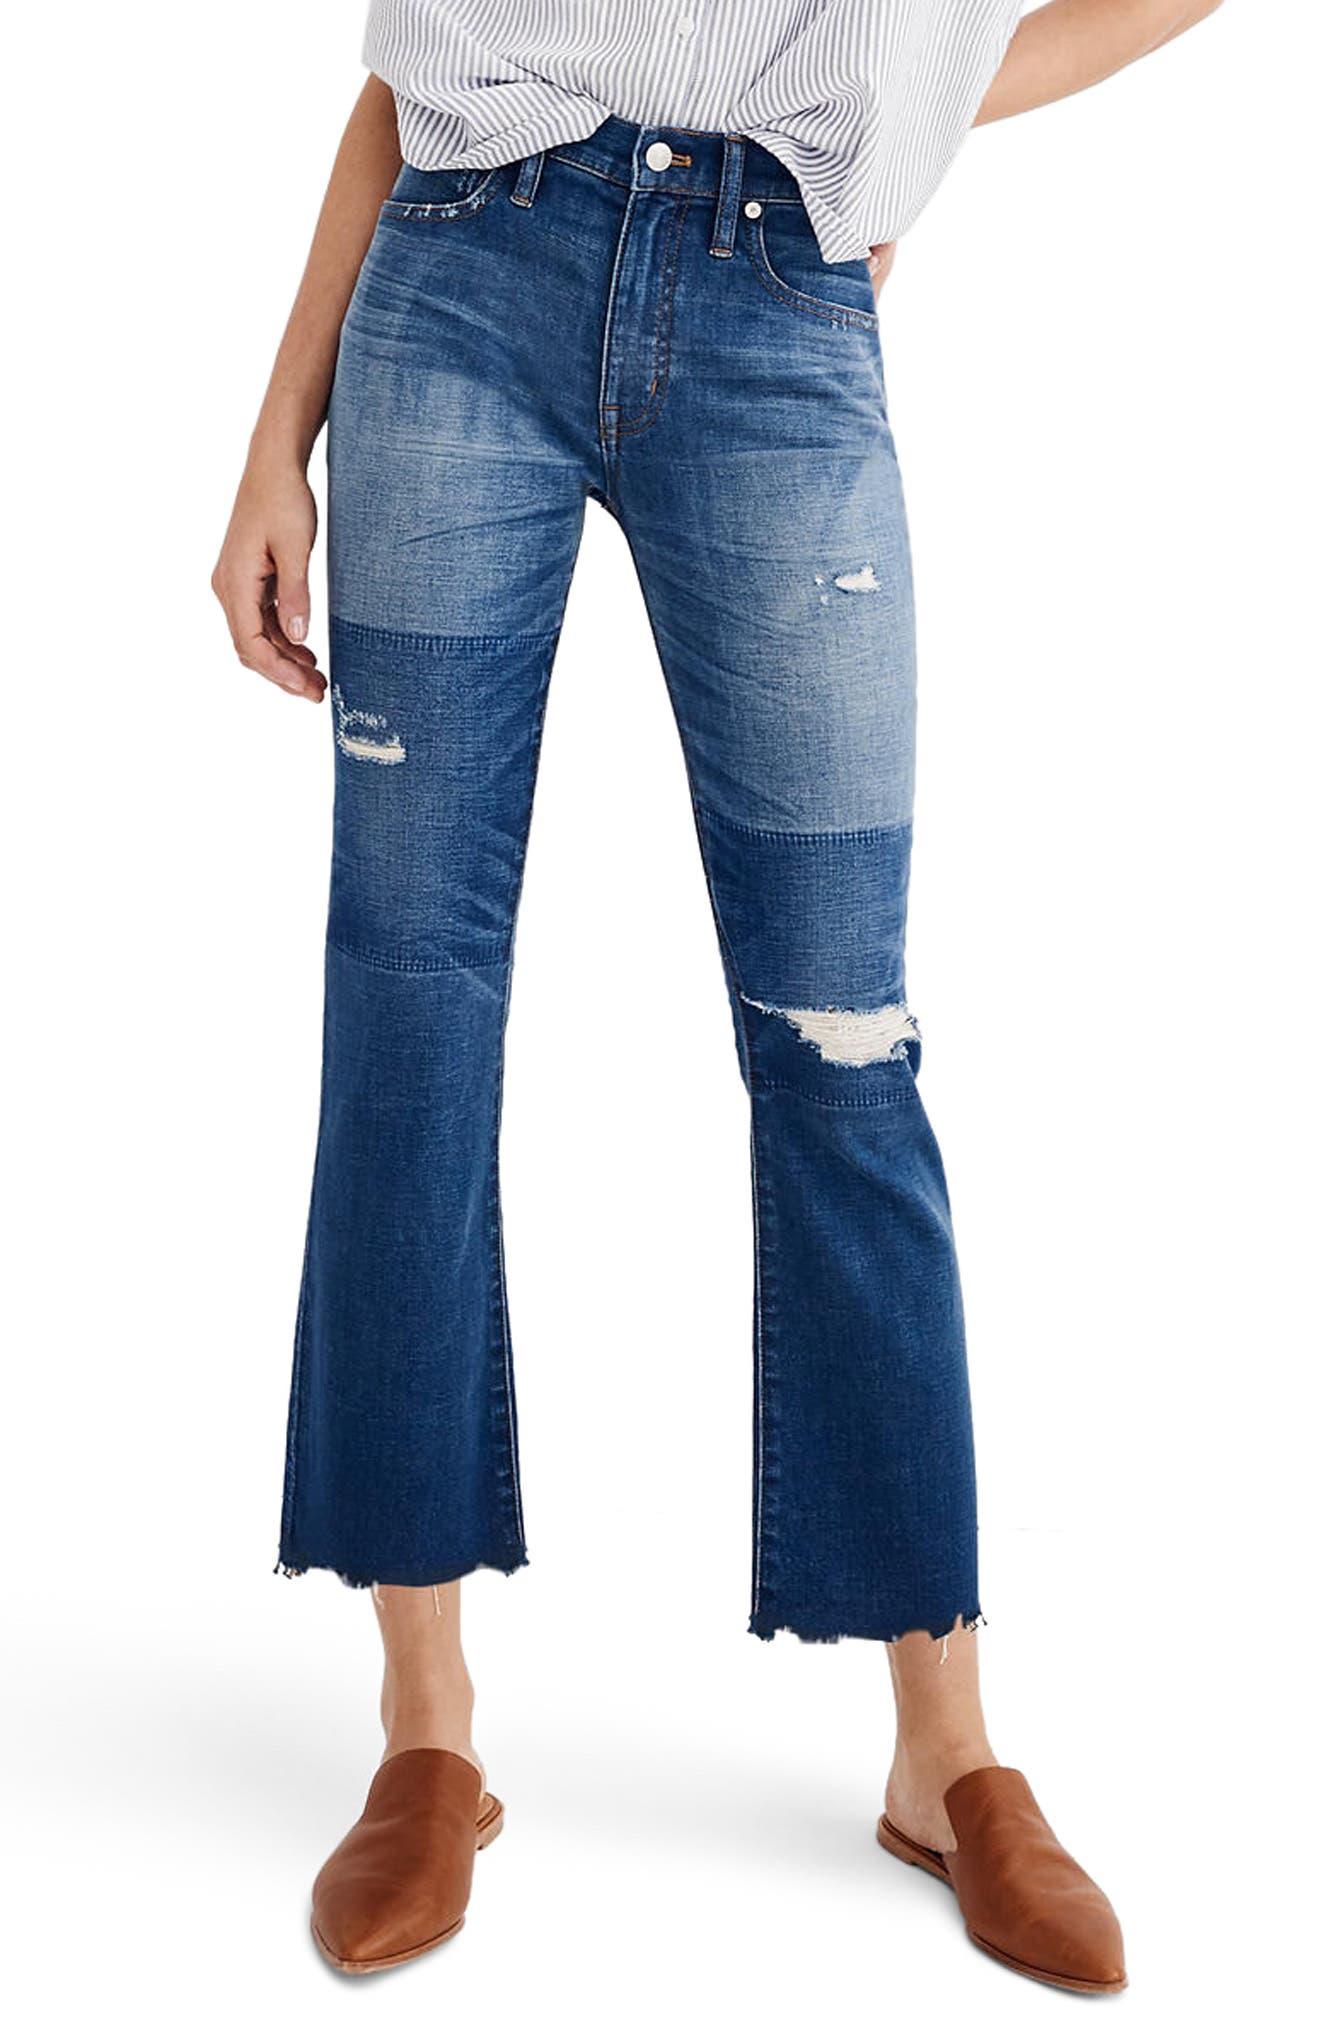 Main Image - Madewell Cali Ripped Demi Bootleg Crop Jeans (Caleb Wash)